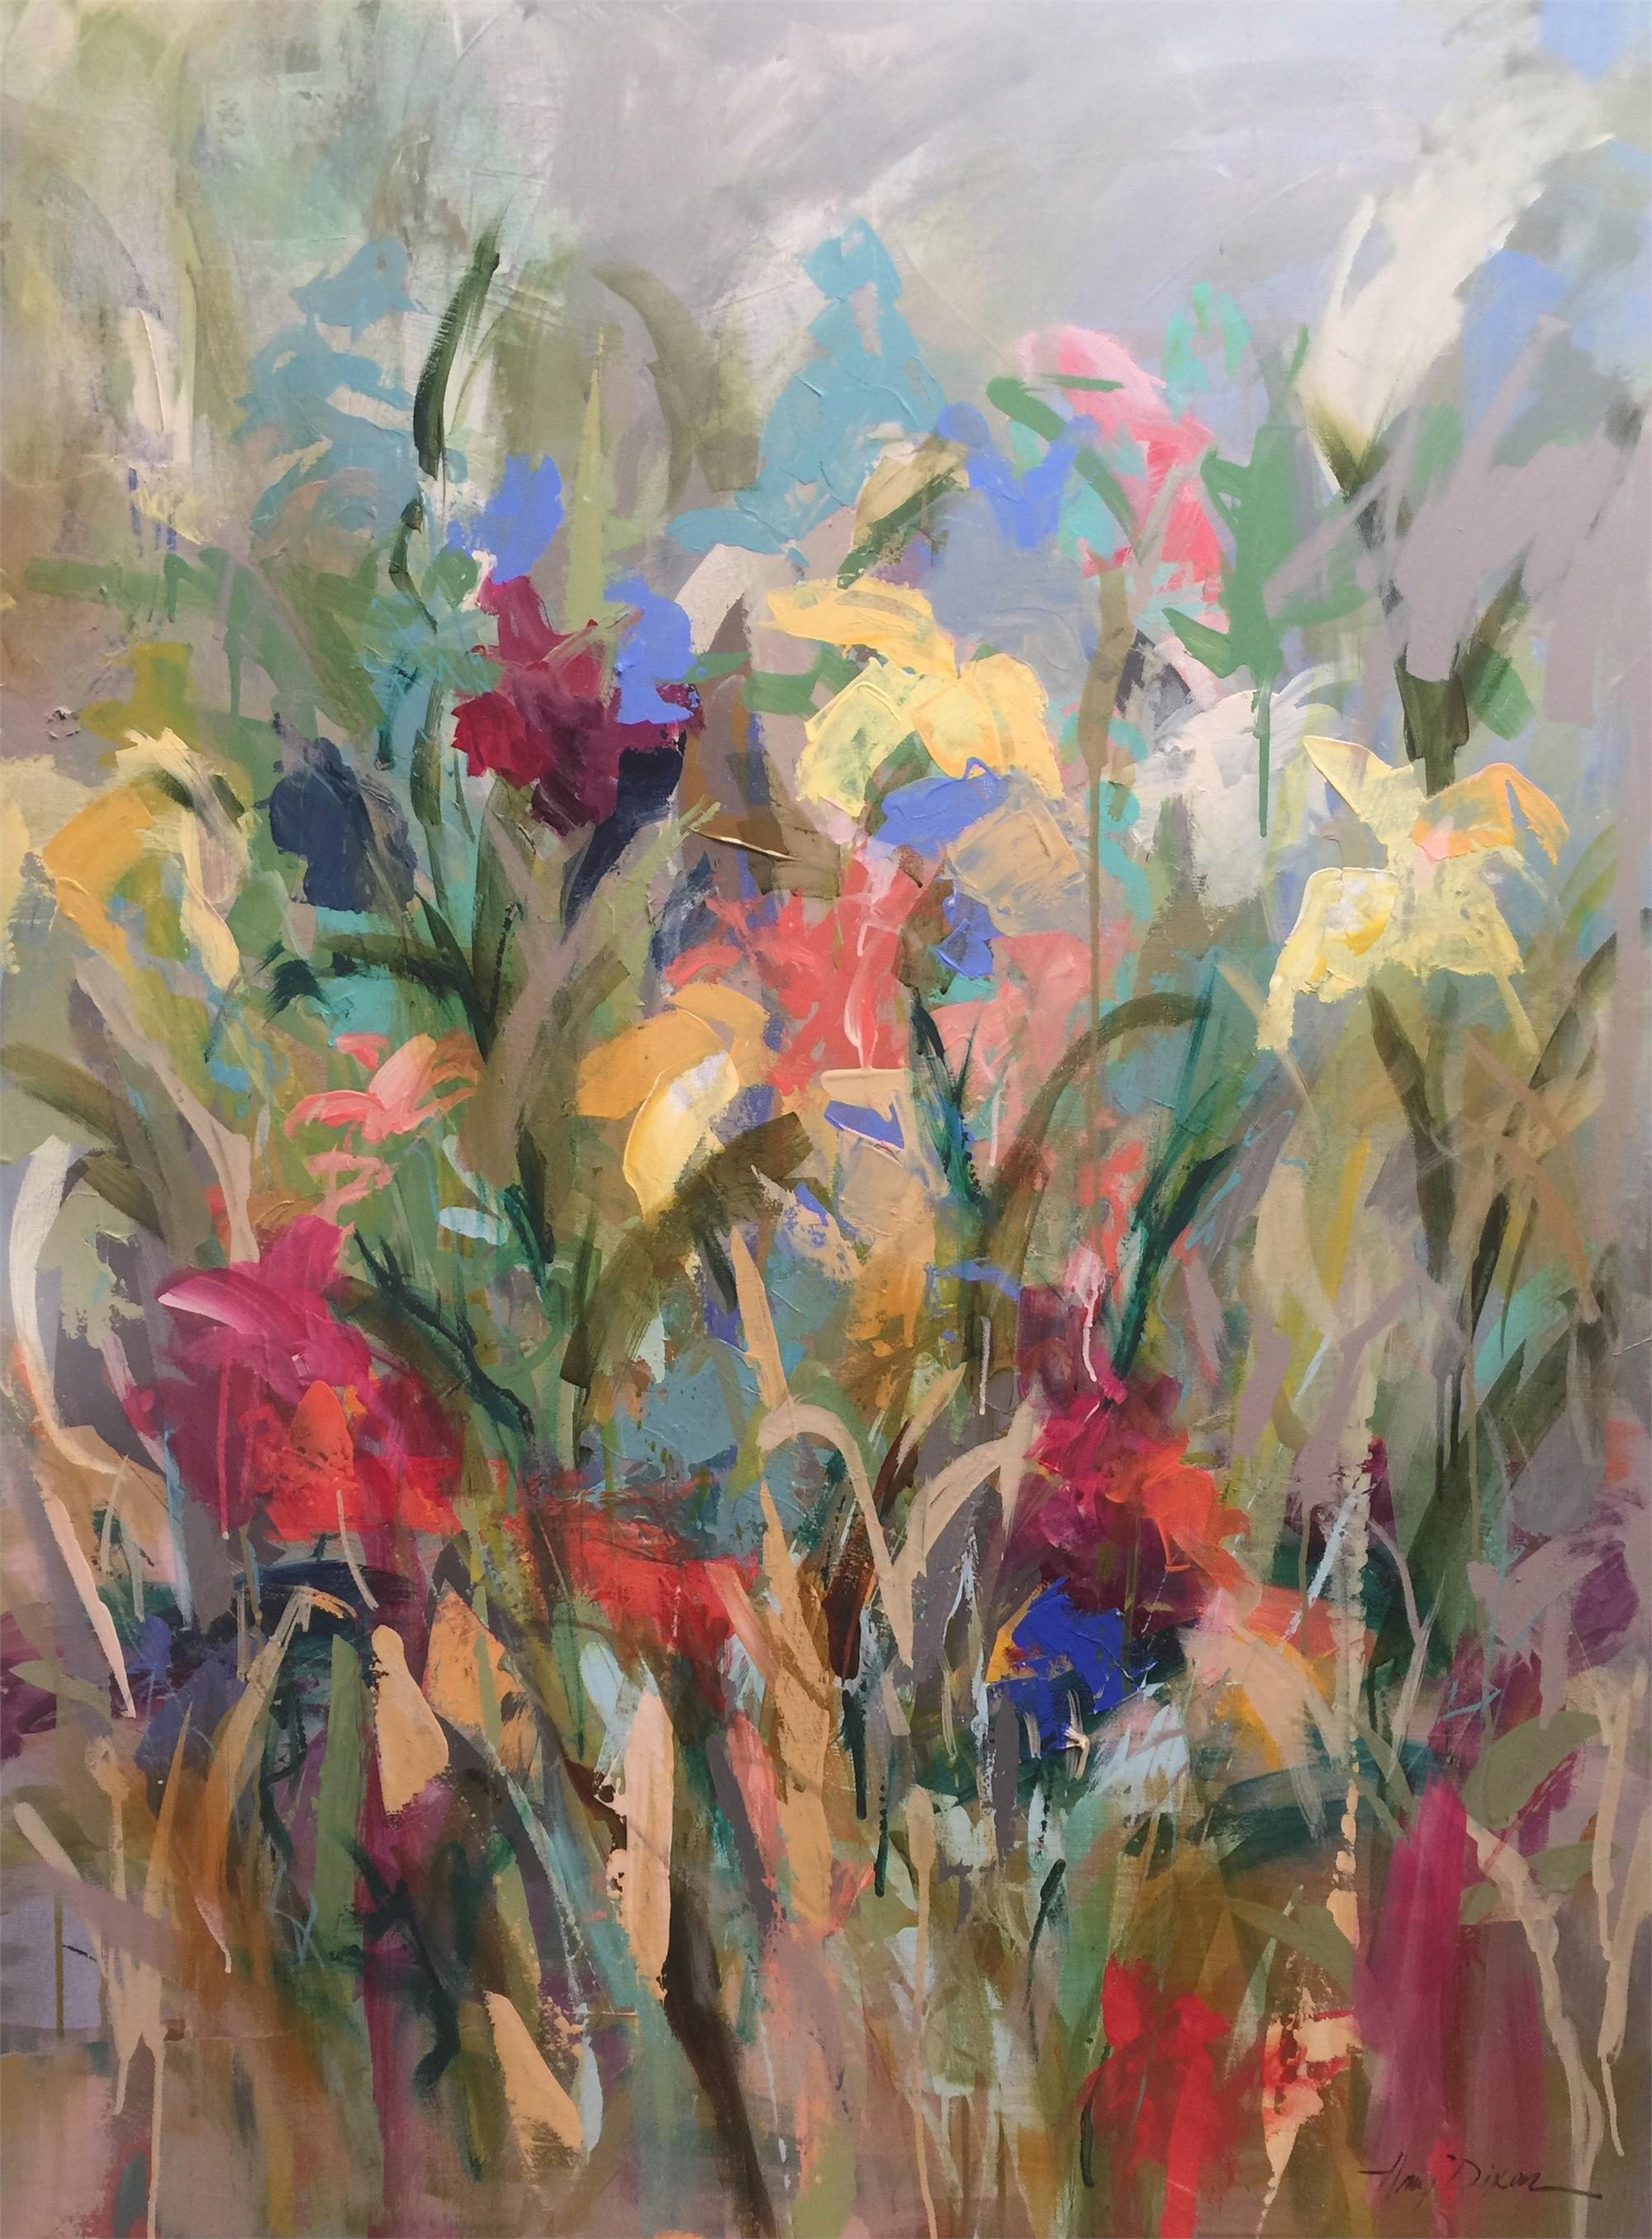 Harmony by Amy Dixon